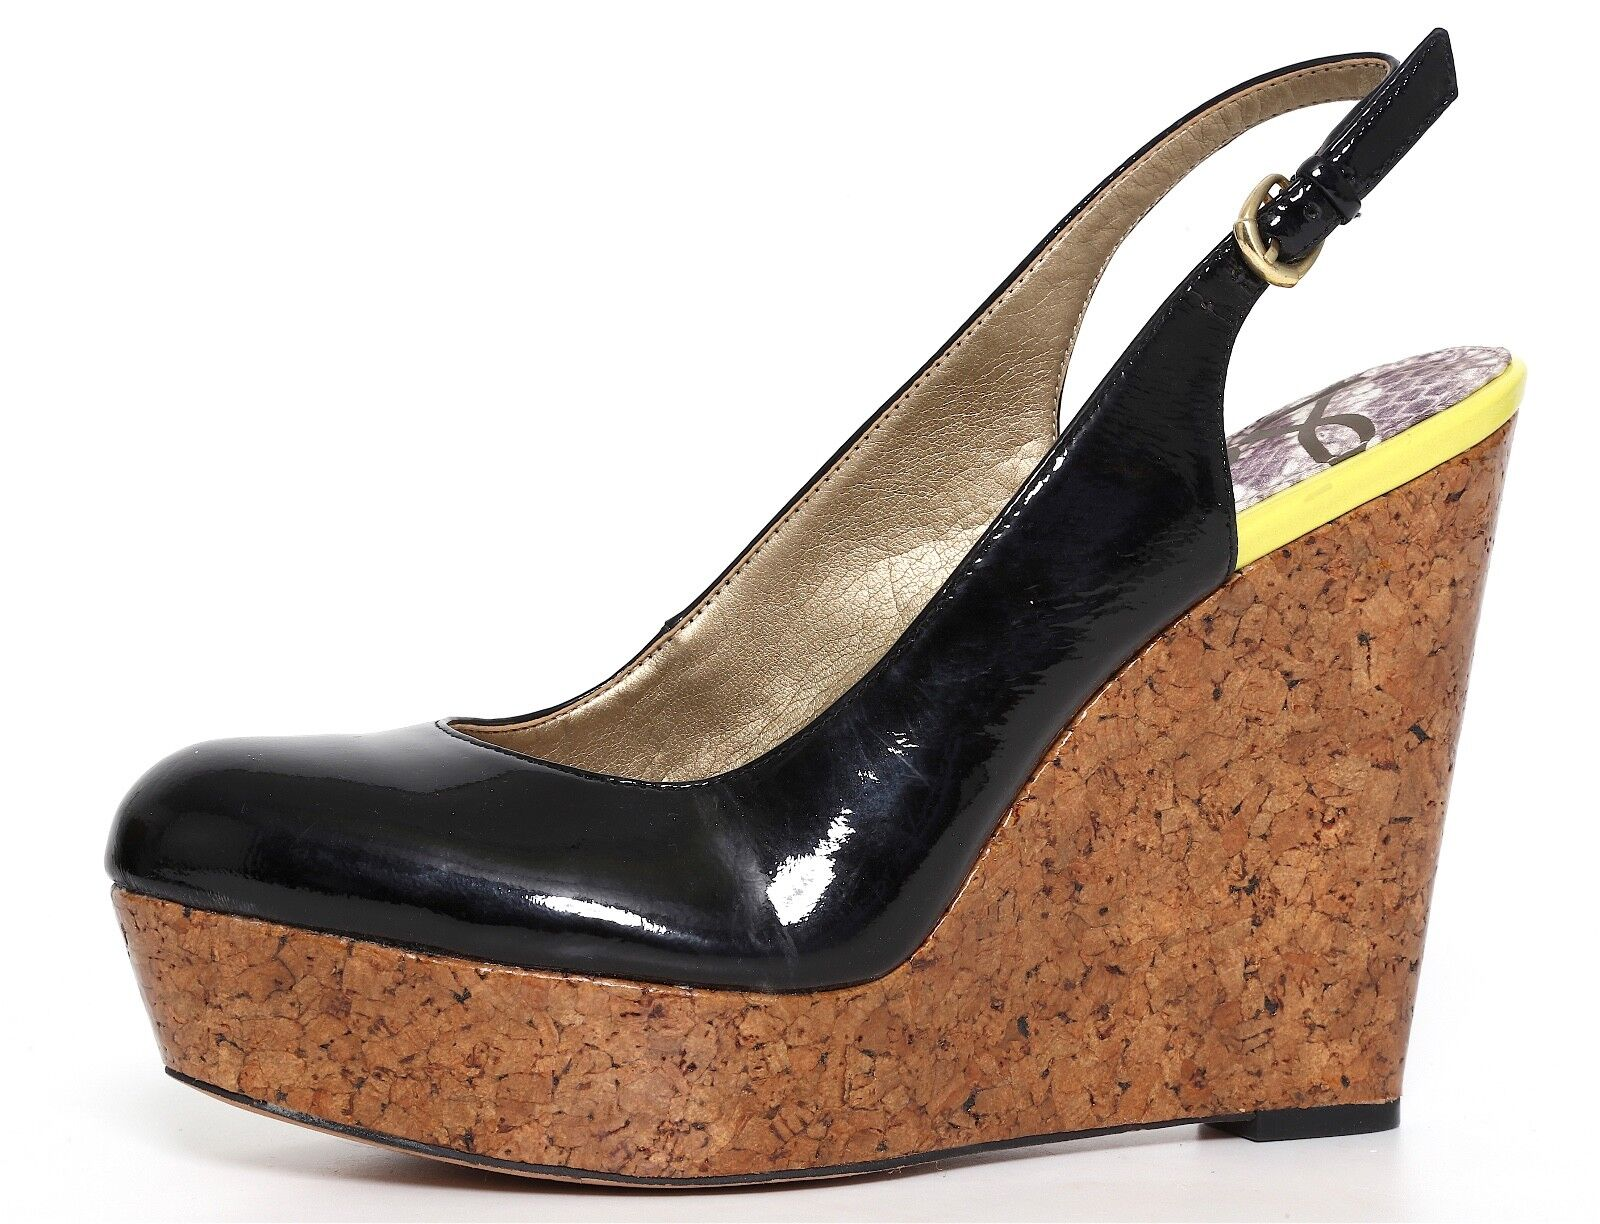 Sam Edelman Mallory Slingback Platform Cork Wedge Patent Pelle Donna Sz9 3180